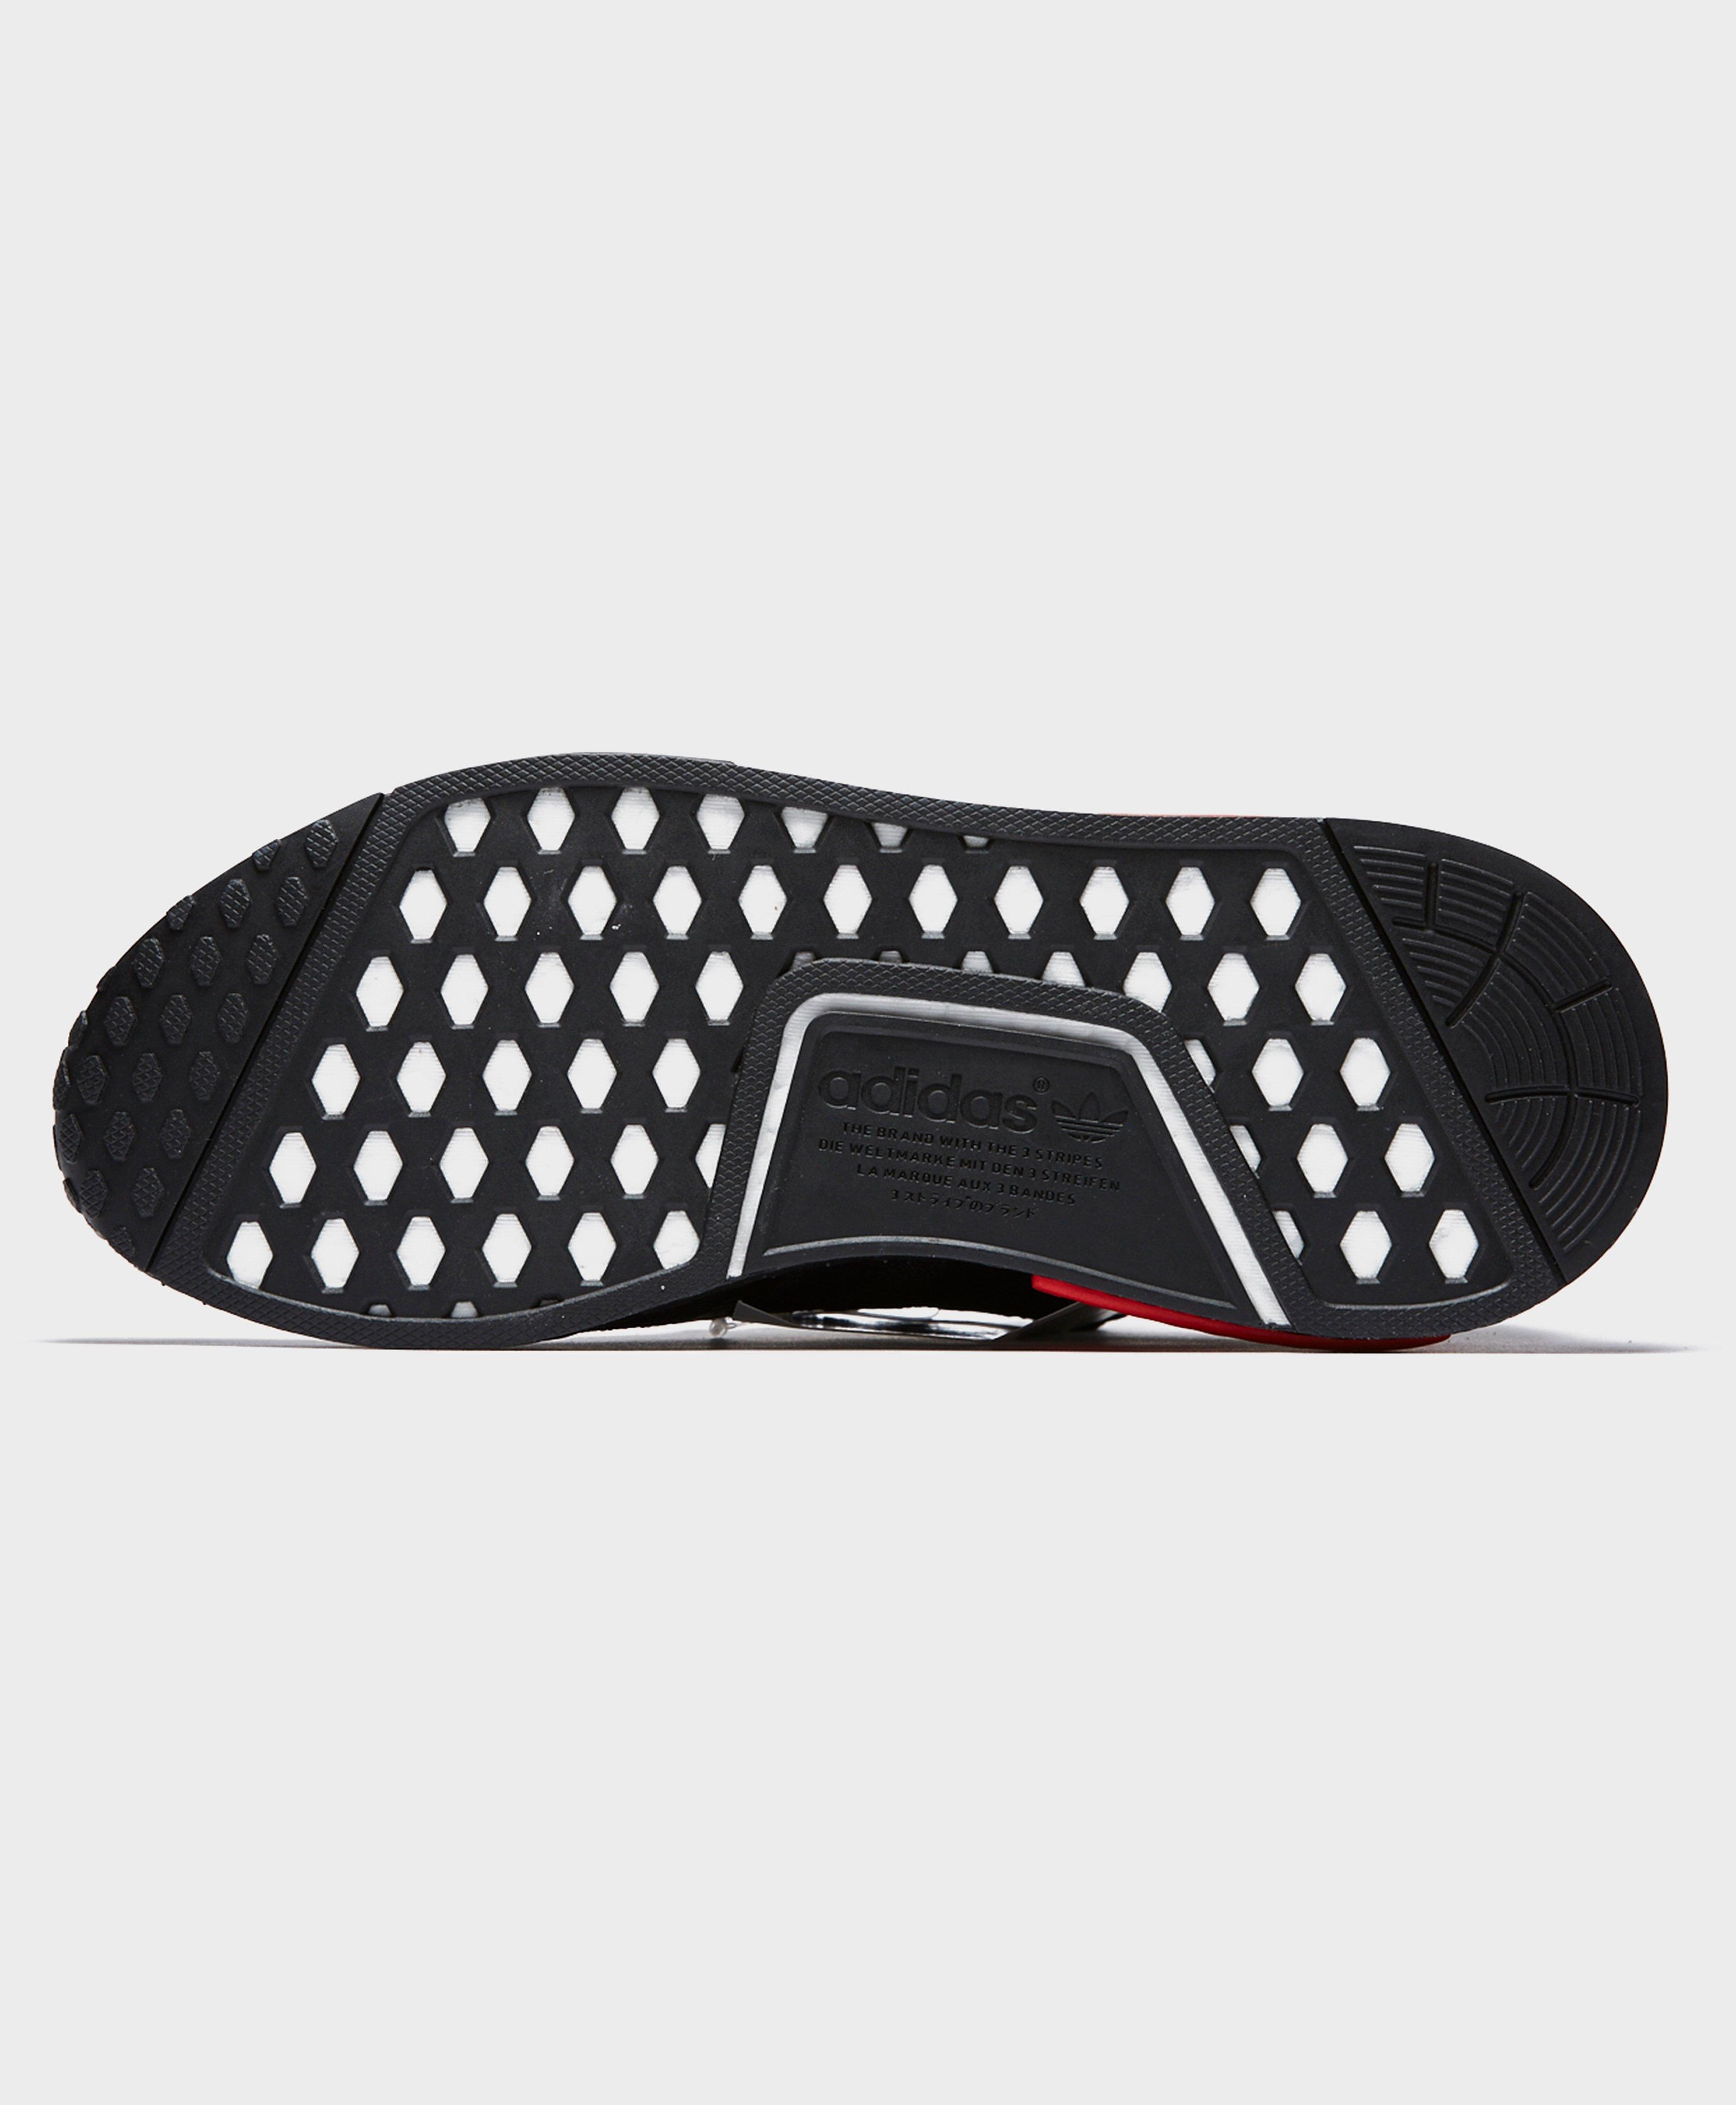 Adidas Originals Nmd R1 Ripstop in Black for Men - Lyst 48cb11ba2